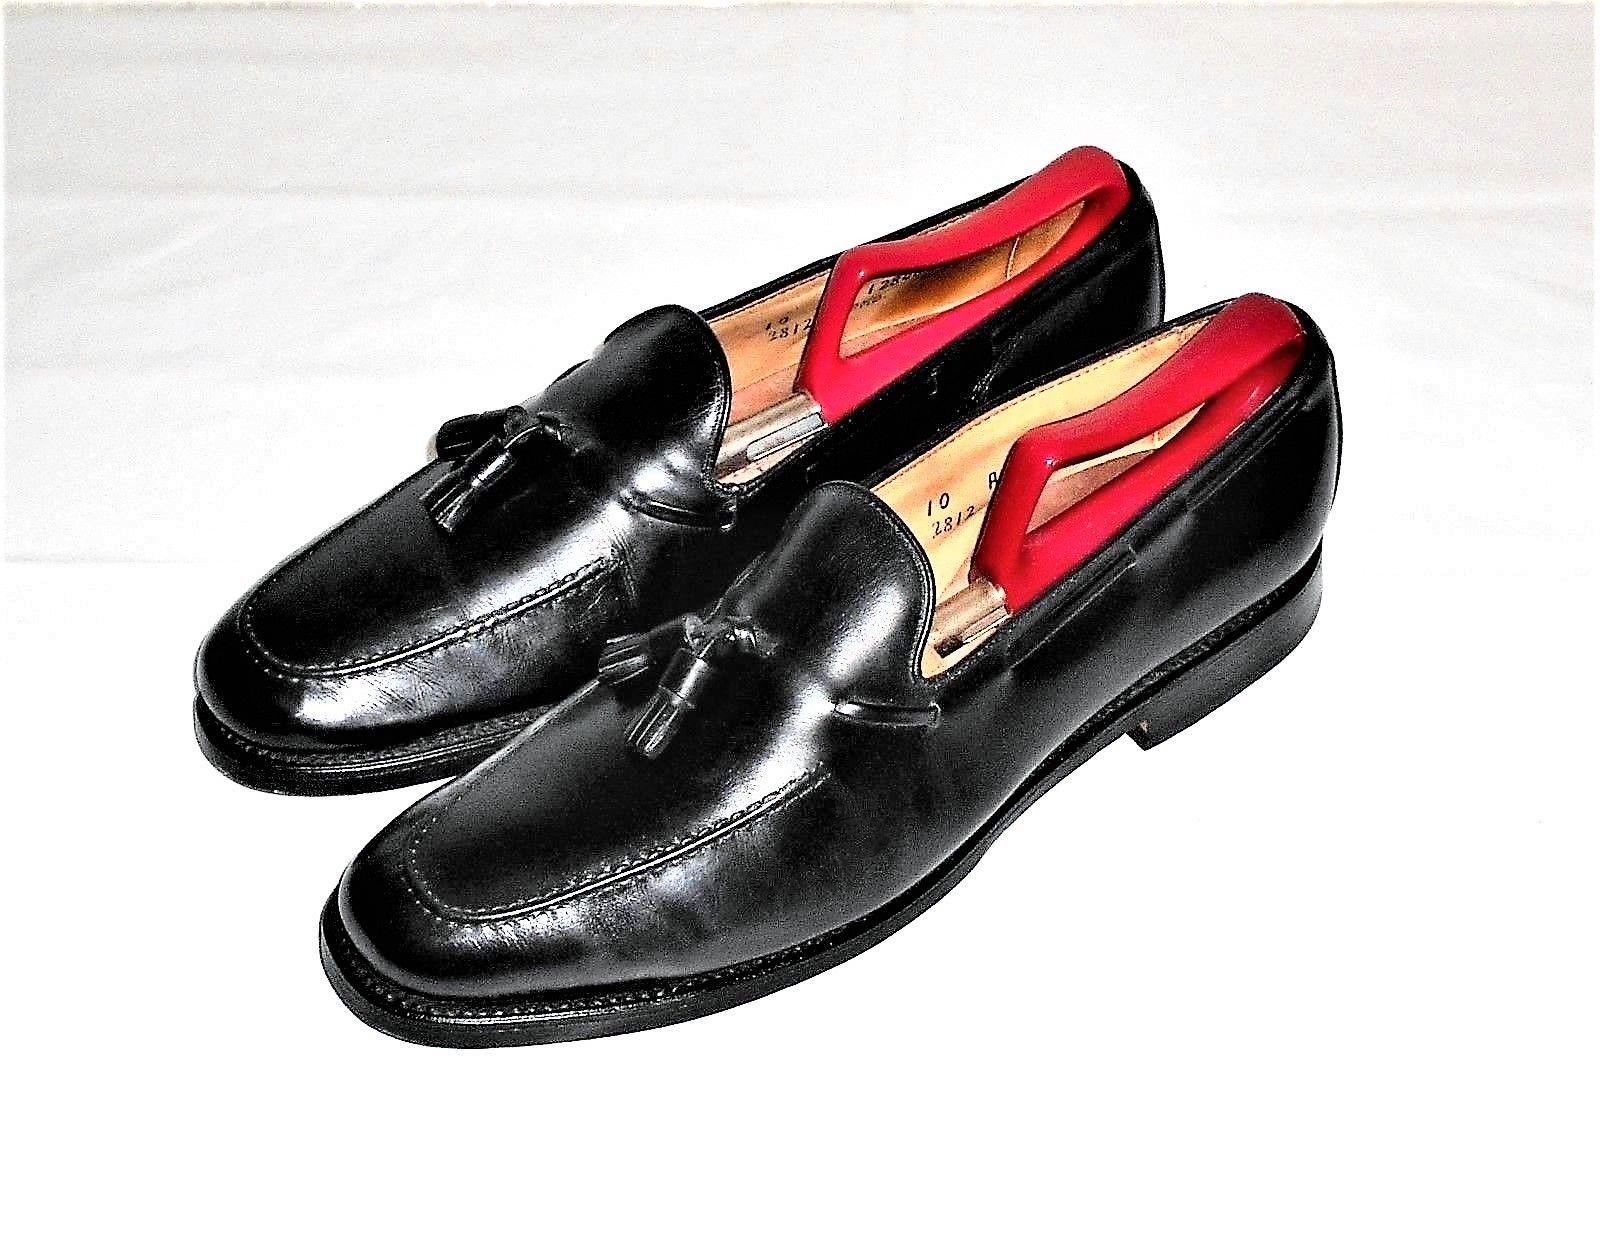 e69cdbc62f6 S l1600. S l1600. Allen Edmonds Cavalier Black Leather Tassel Loafer Slip On  ...